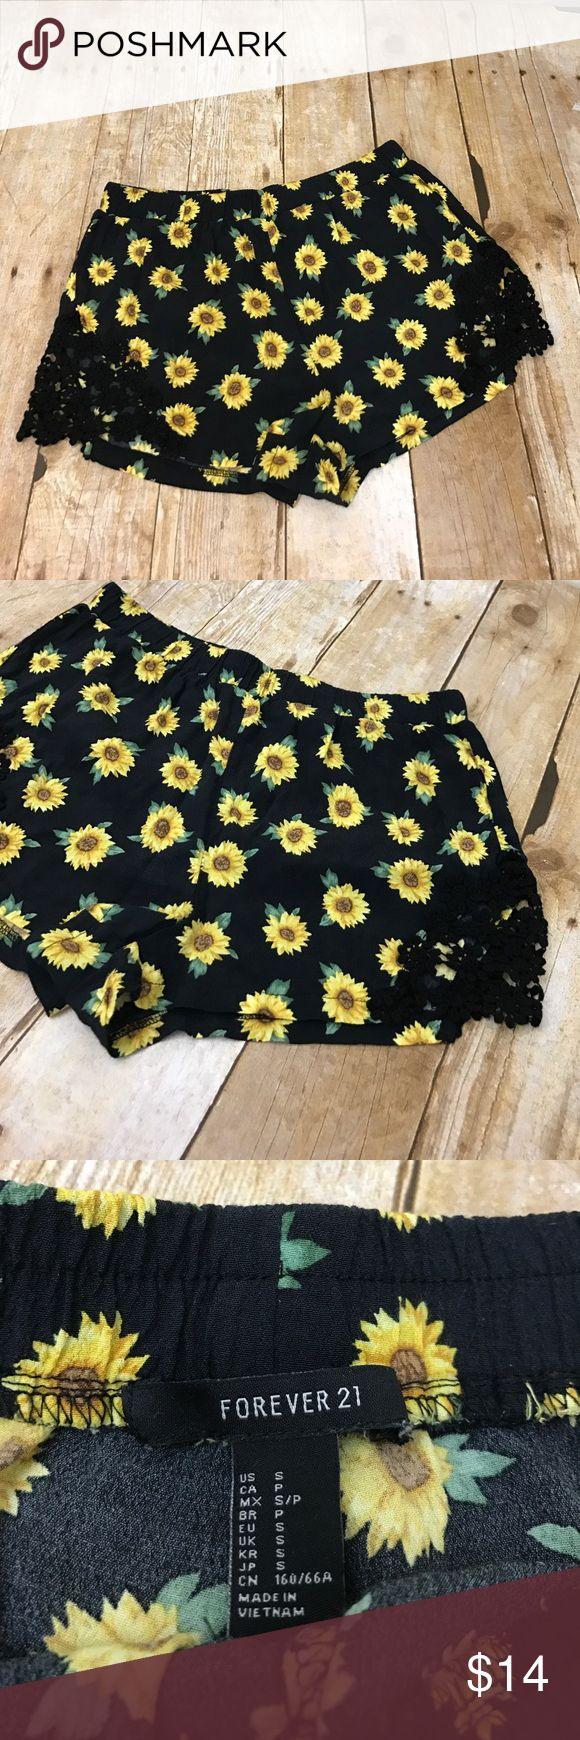 Forever 21 Sunflower Summer Vibes Crochet Shorts S Forever 21 Brand - Size Small - Sunflower Print - Crochet flower detail on thighs - excellent condition - FAST SHIPPING !! Forever 21 Shorts